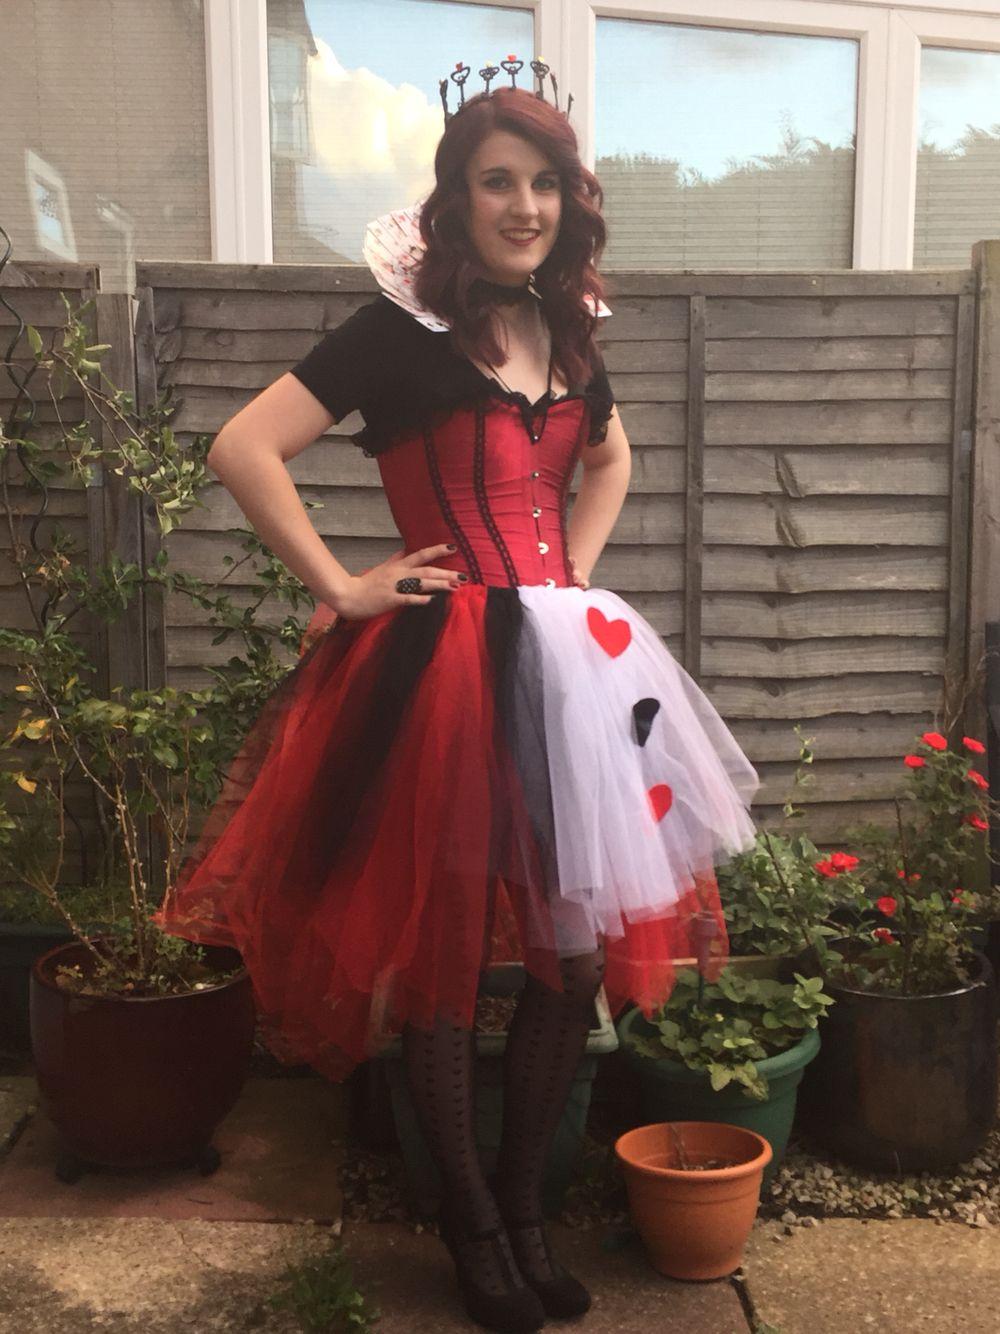 Queen of hearts costume, DIY tutu, crown, card collar